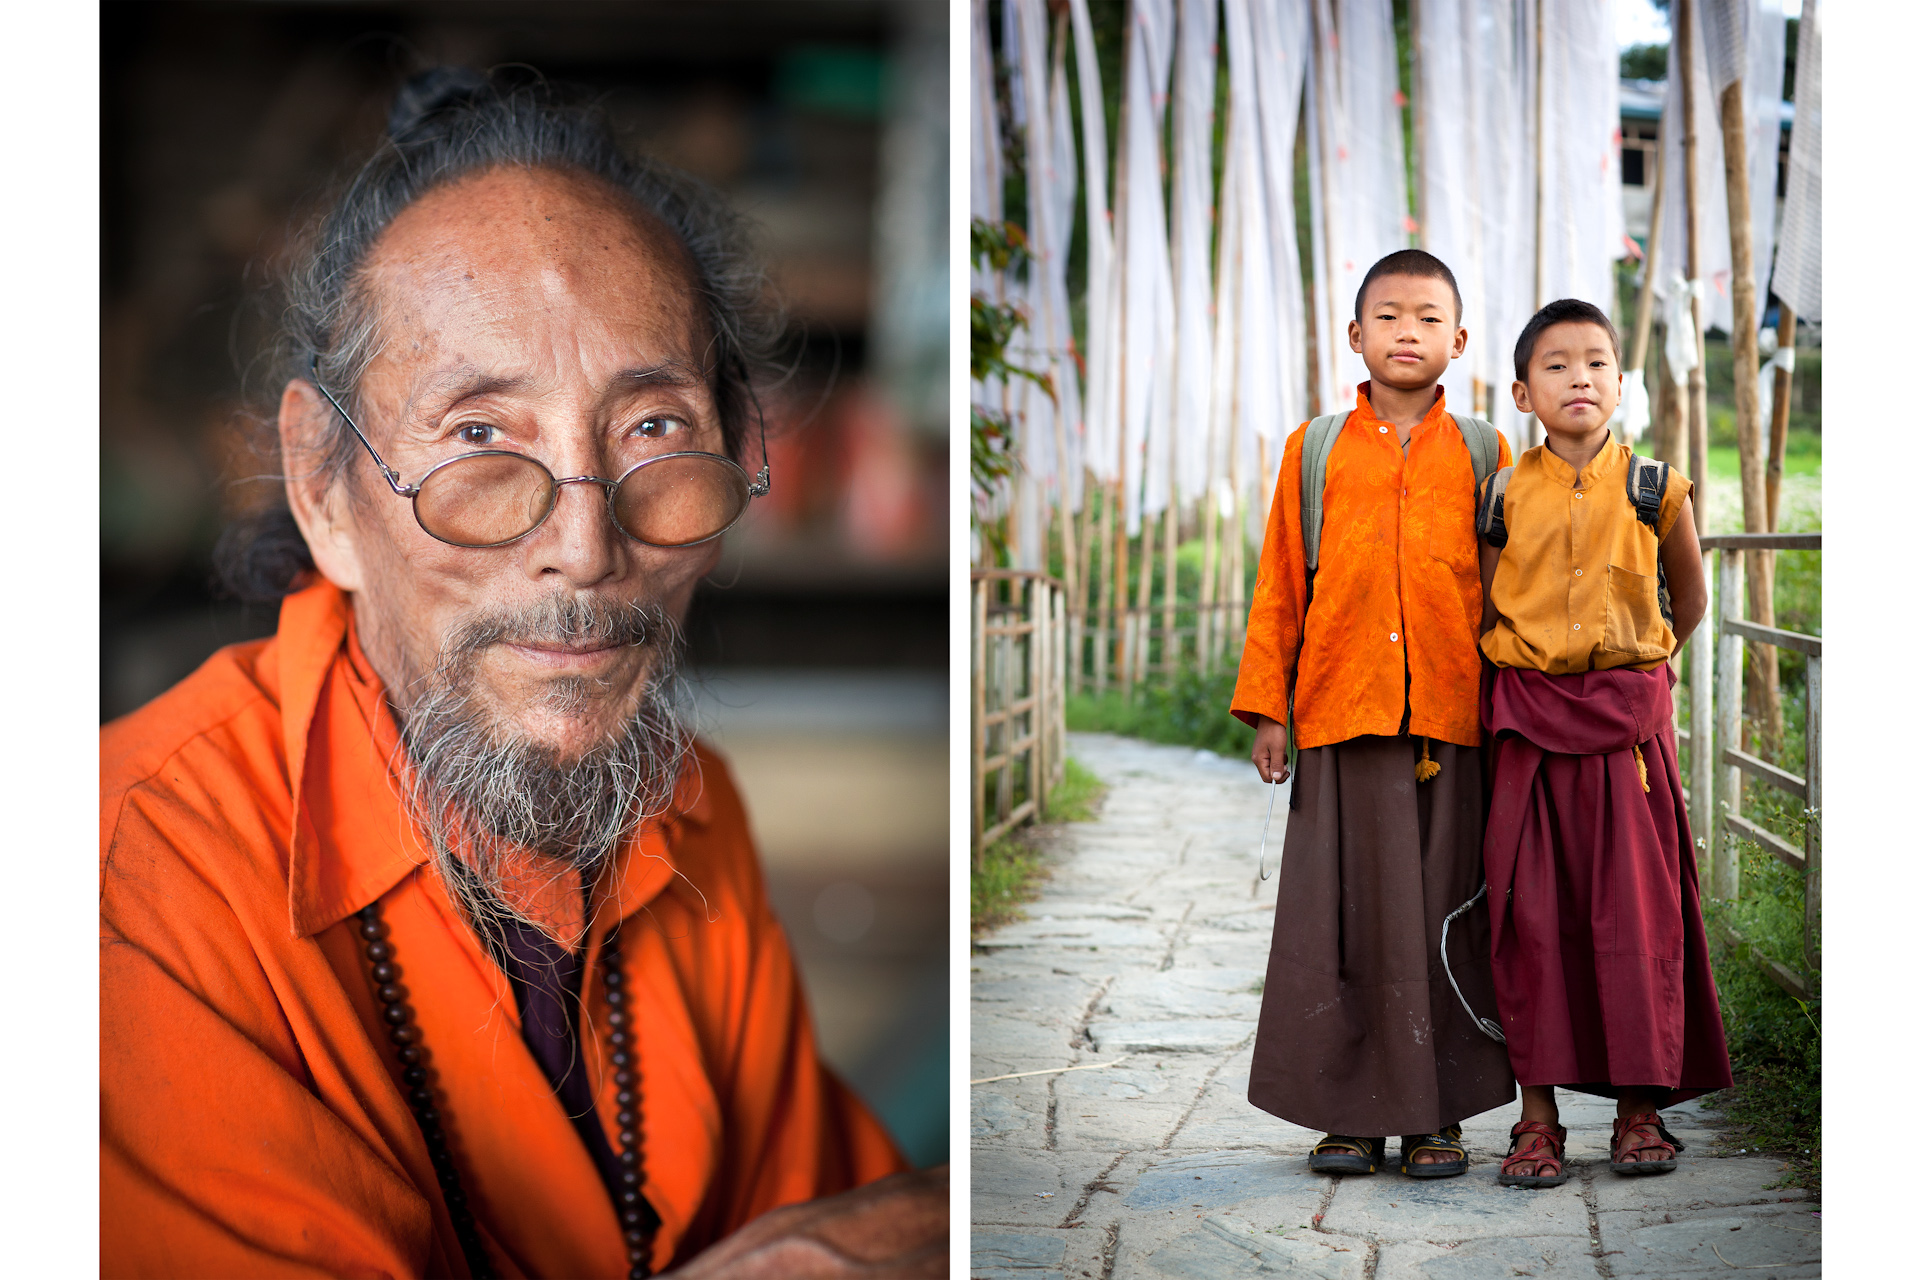 India-Sikkim-Travel-Tashiding-Monastery-Monk-Portrait-1.JPG